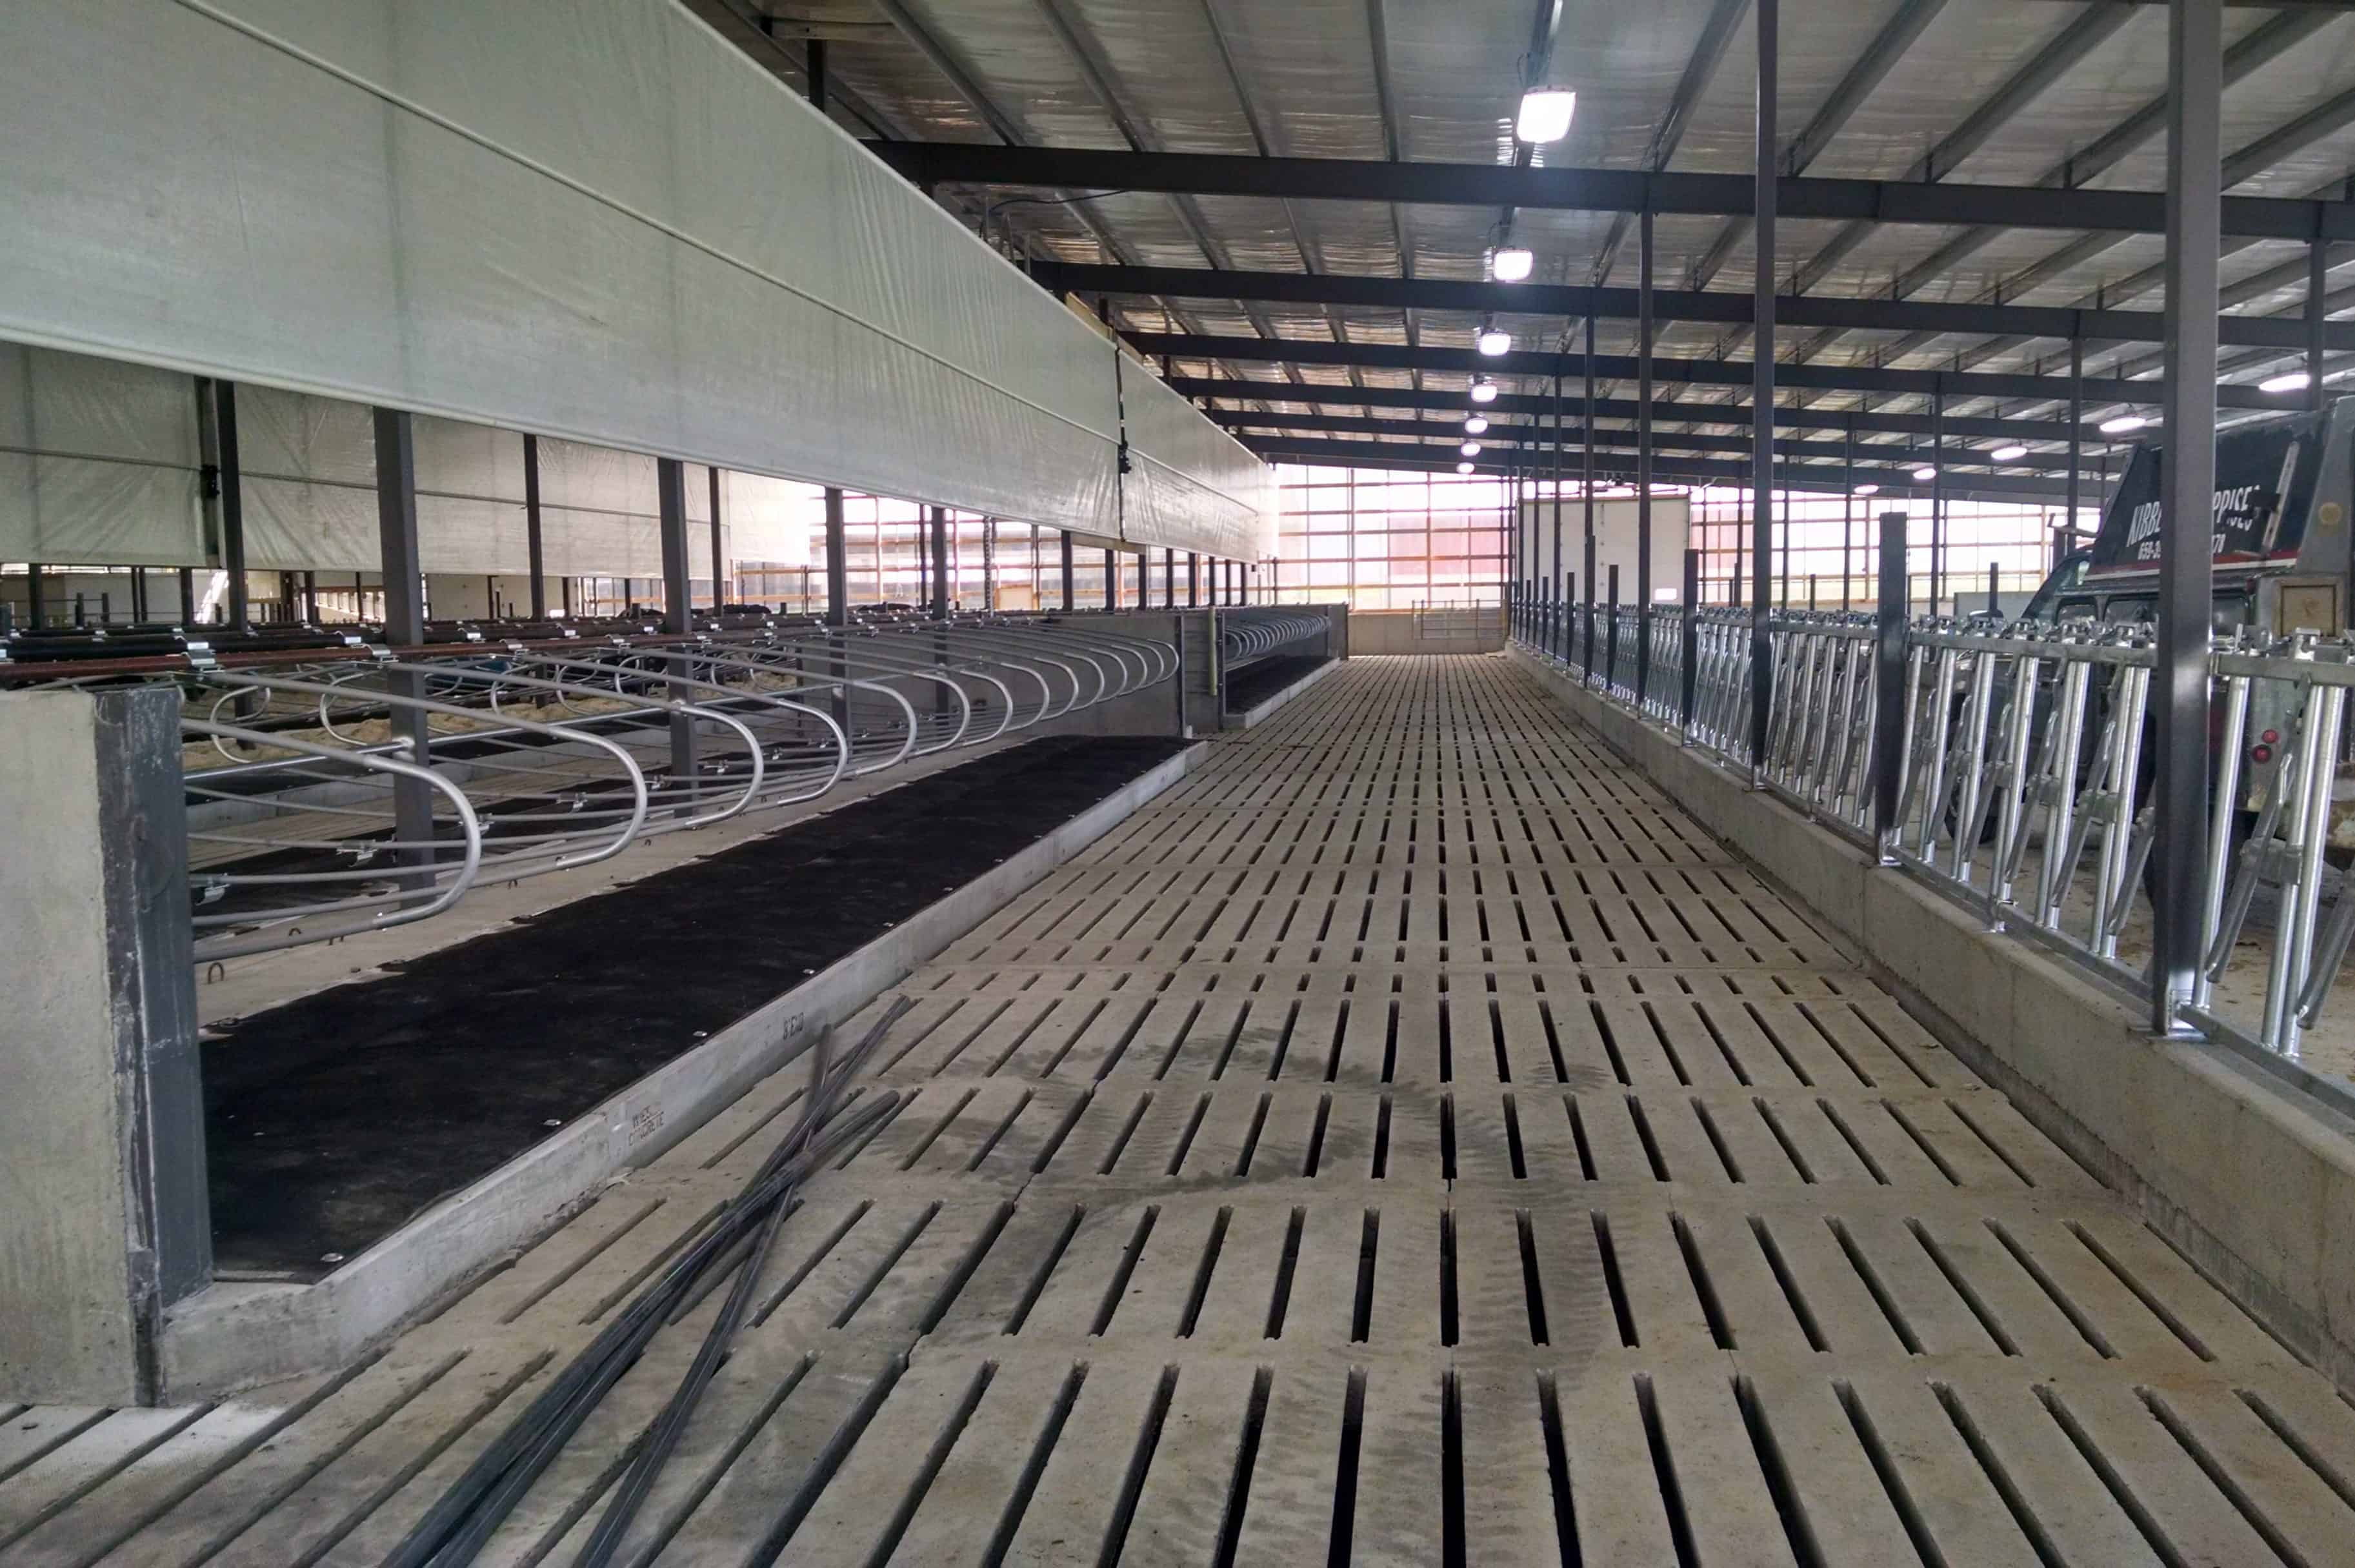 Slatted Floor Manure Storage Dairy Stalls Rem Jem Precast Concrete